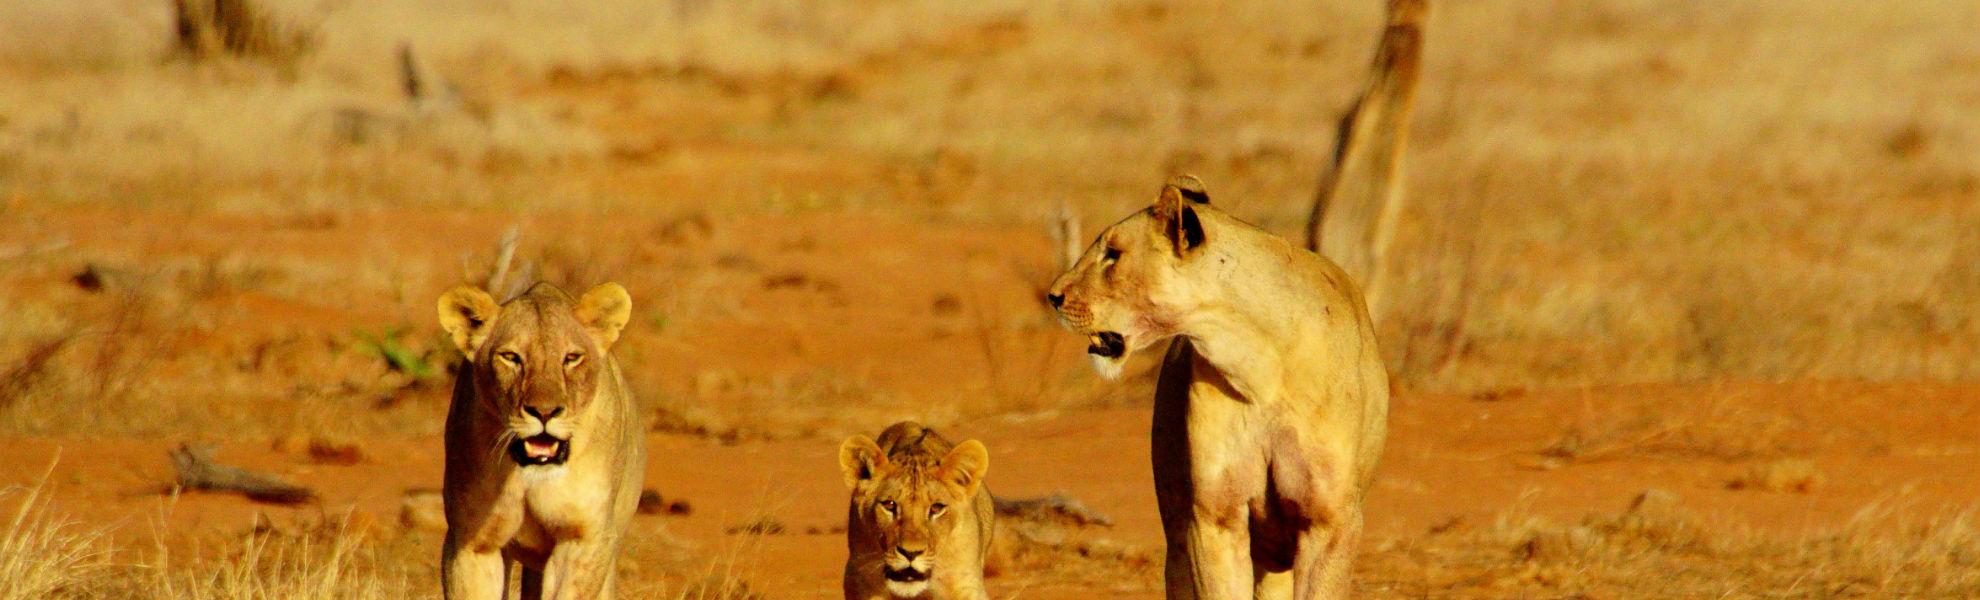 Löwen im Tsavo Ost Nationalpark